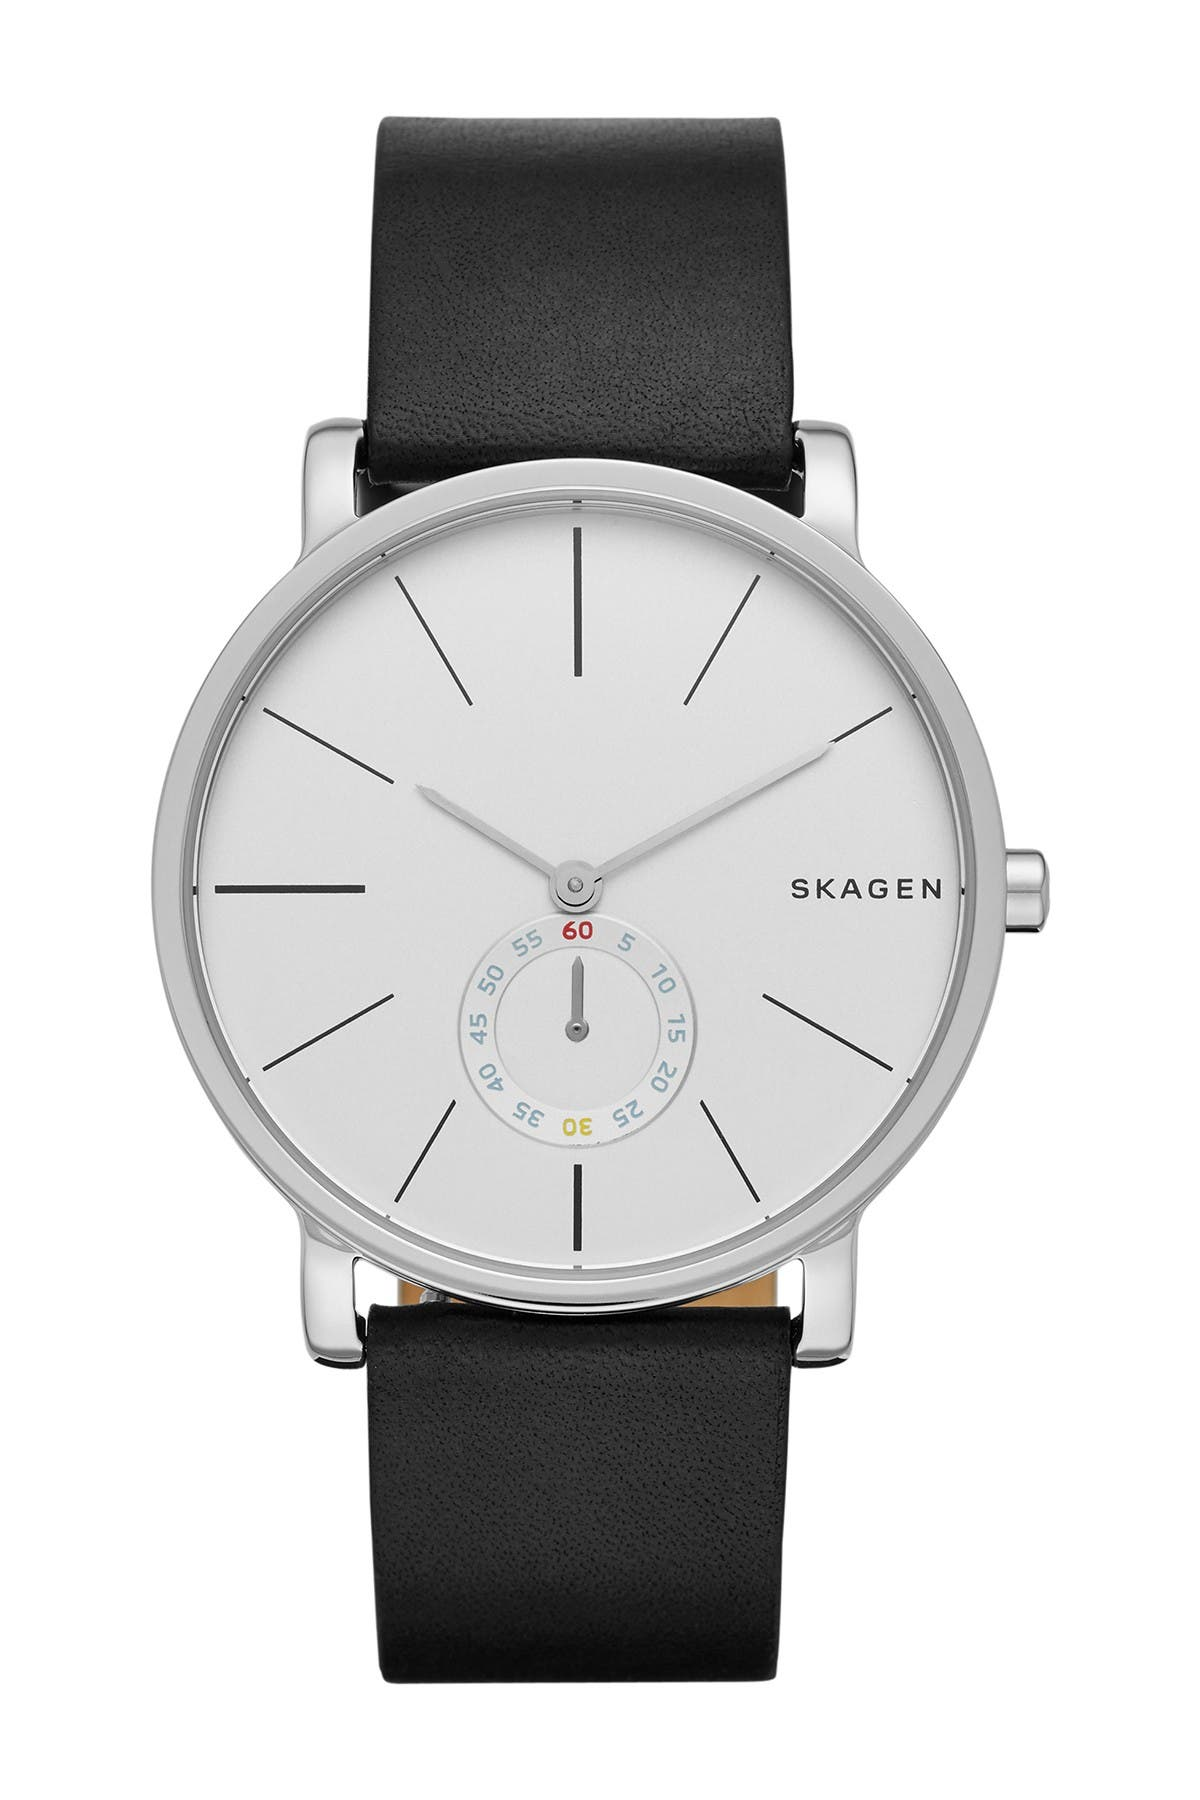 Image of Skagen Men's Hagen Leather Strap Watch, 40mm